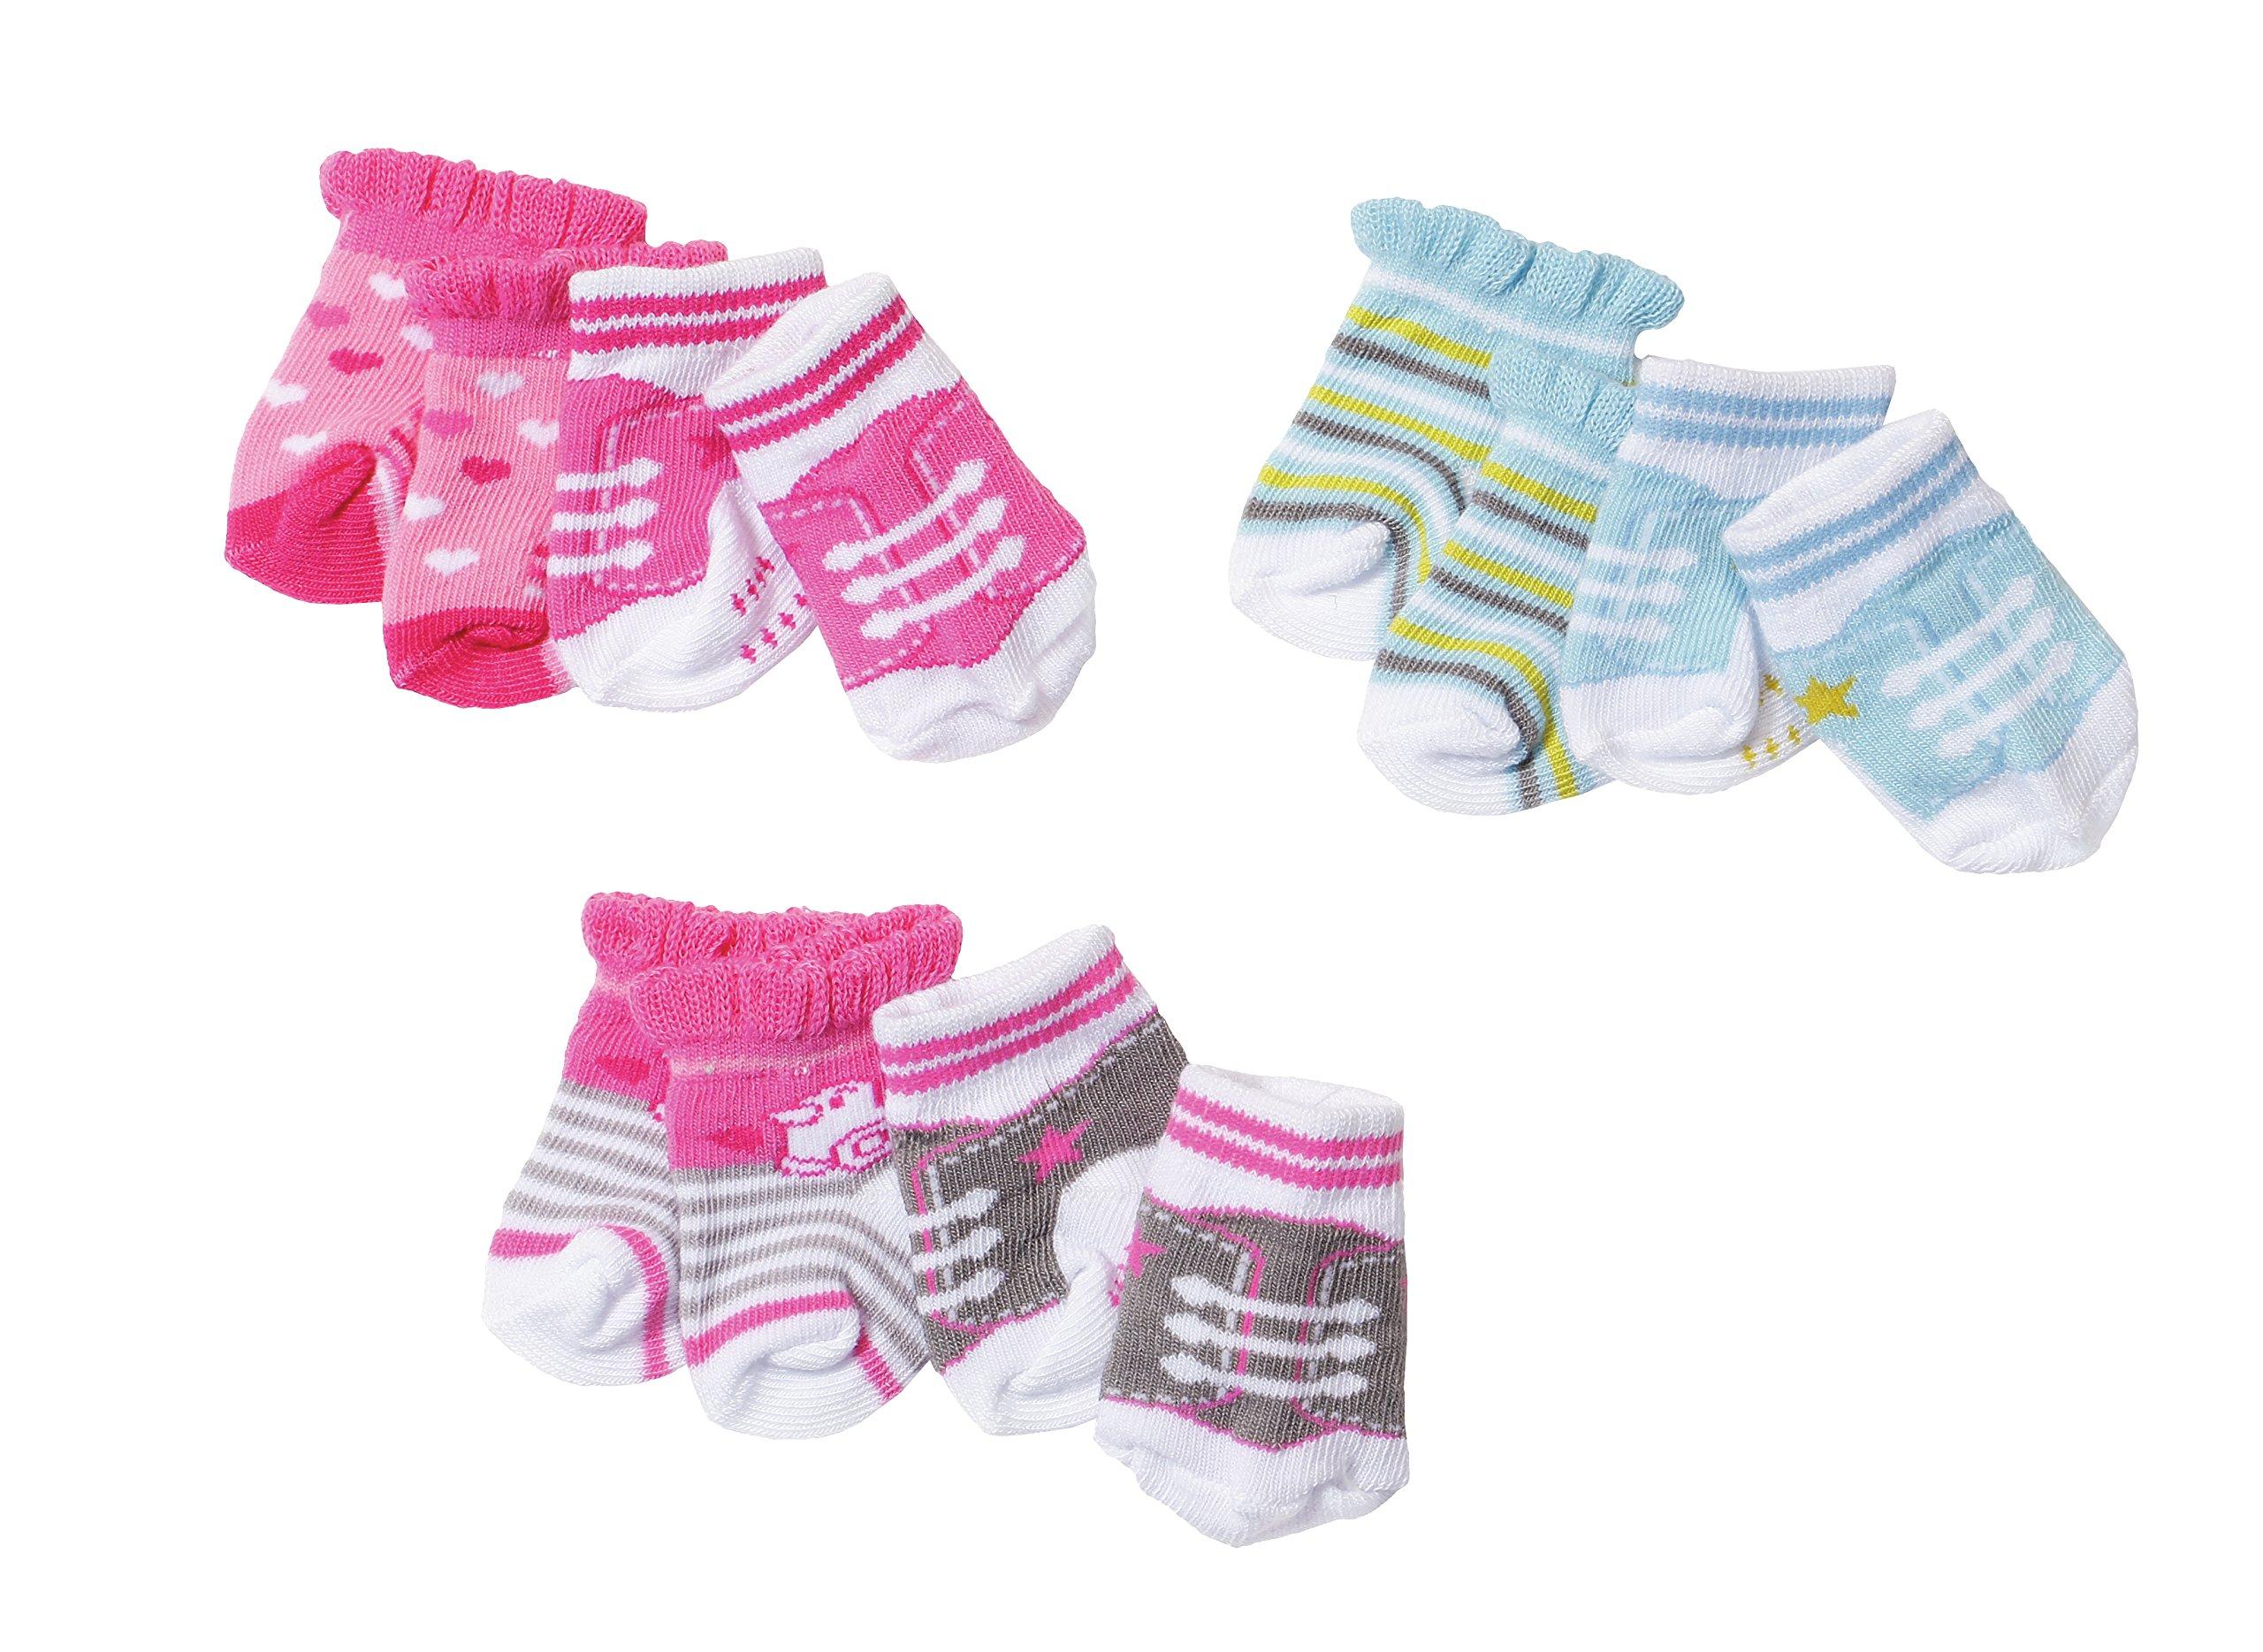 BABY born Socks, 2 pack Calcetines de muñeca - Accesorios para muñecas (2 pack, Calcetines de muñeca, 3 año(s… 1